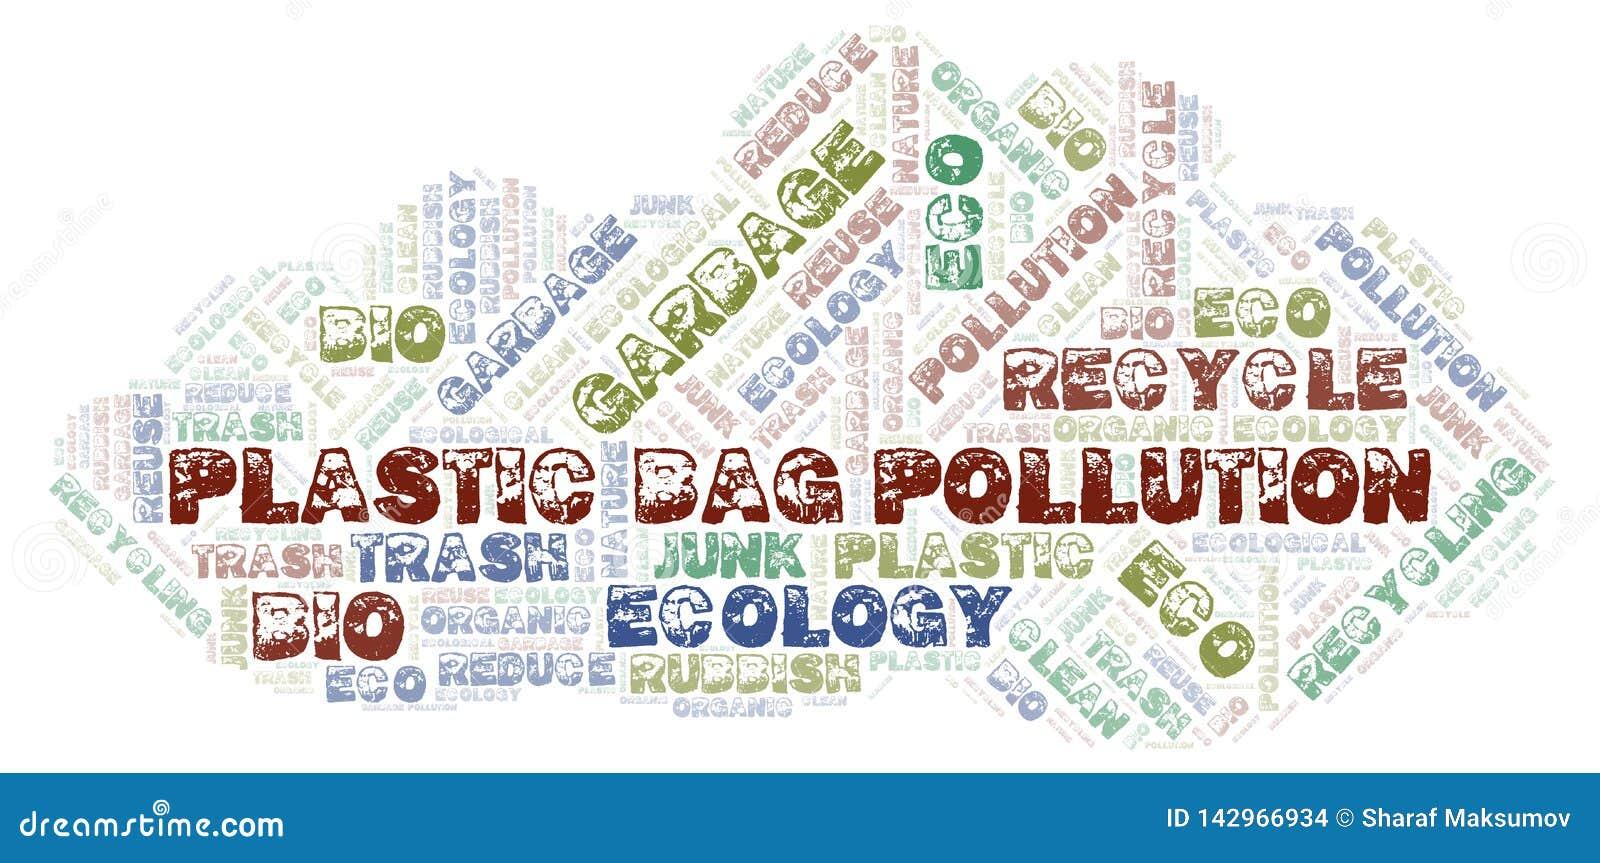 Plastic Bag Pollution word cloud